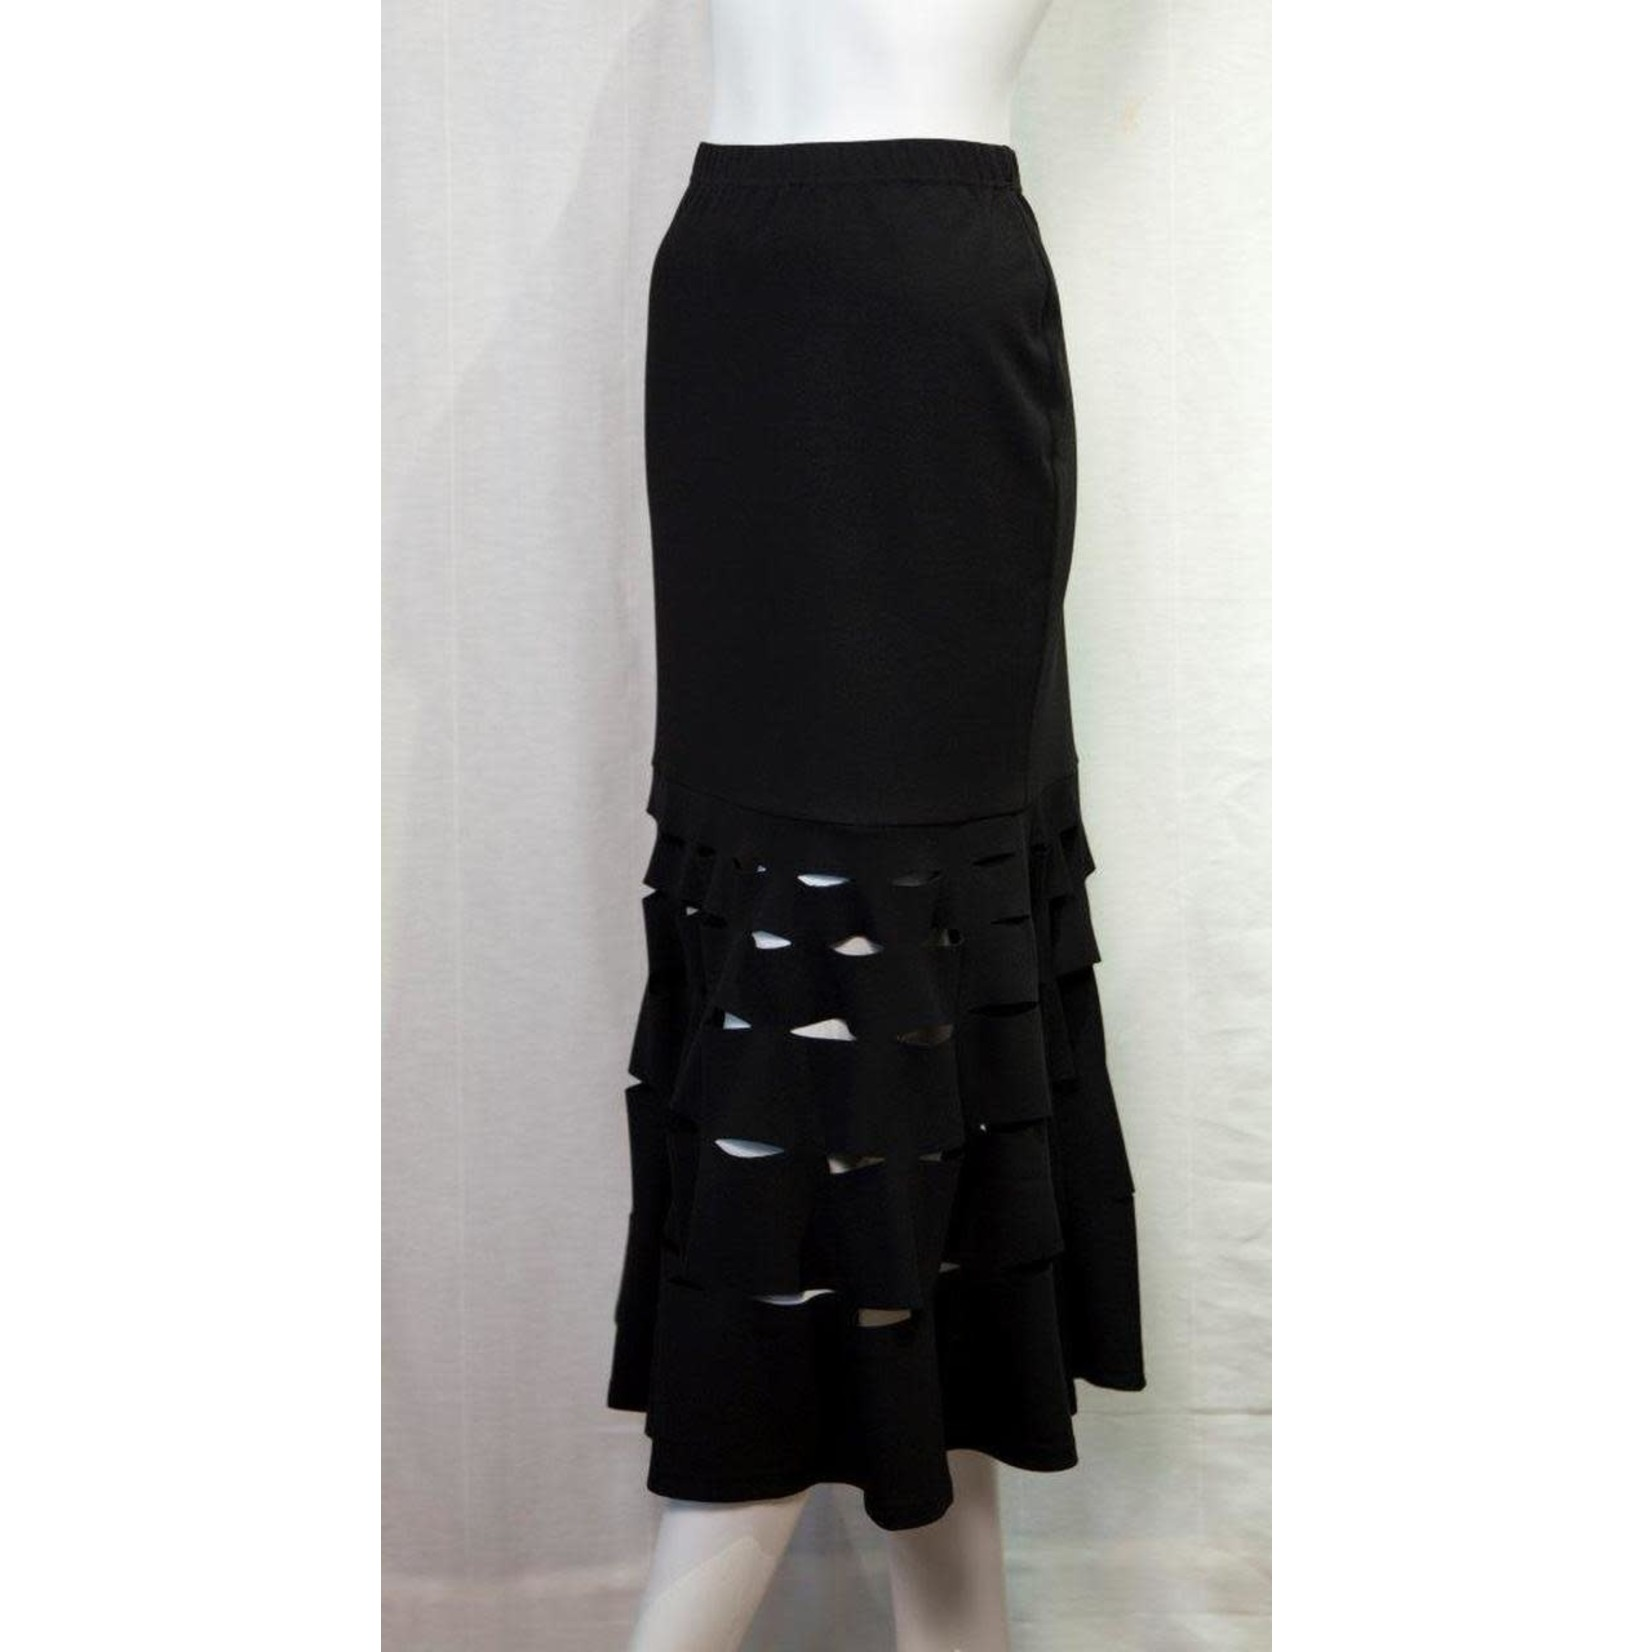 Samuel Dong Knit Crepe Laser Cut Skirt